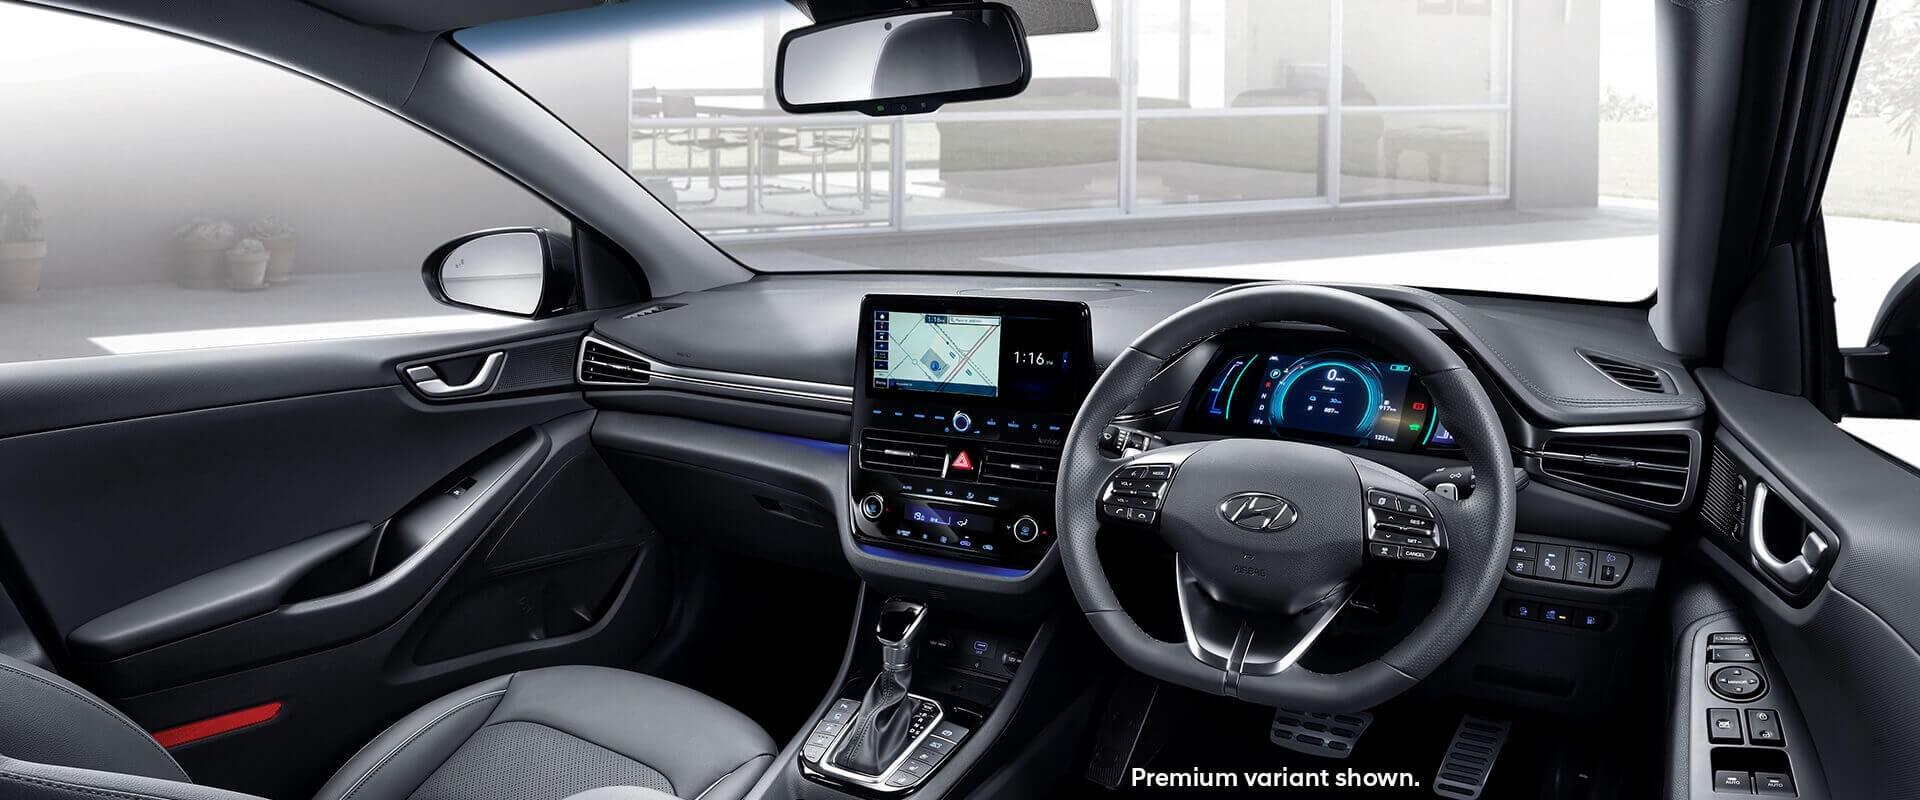 Hyundai IONIQ Plug-In Hybrid Interior